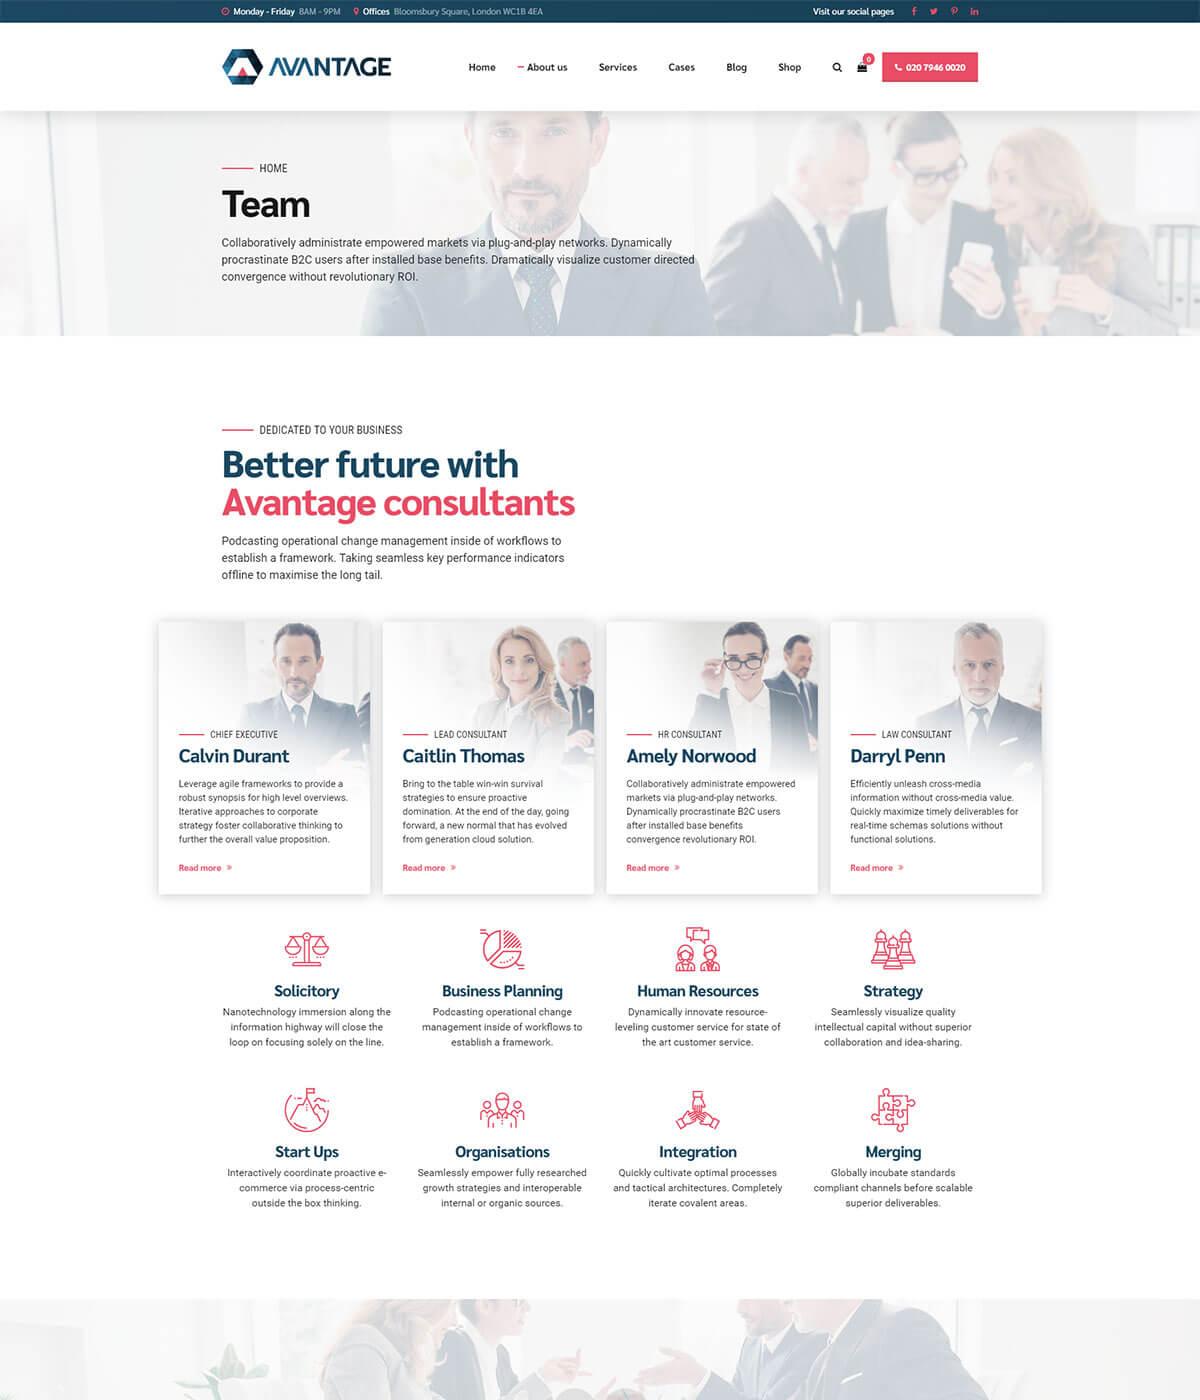 https://avantage.bold-themes.com/wp-content/uploads/2019/05/business-03-team.jpg